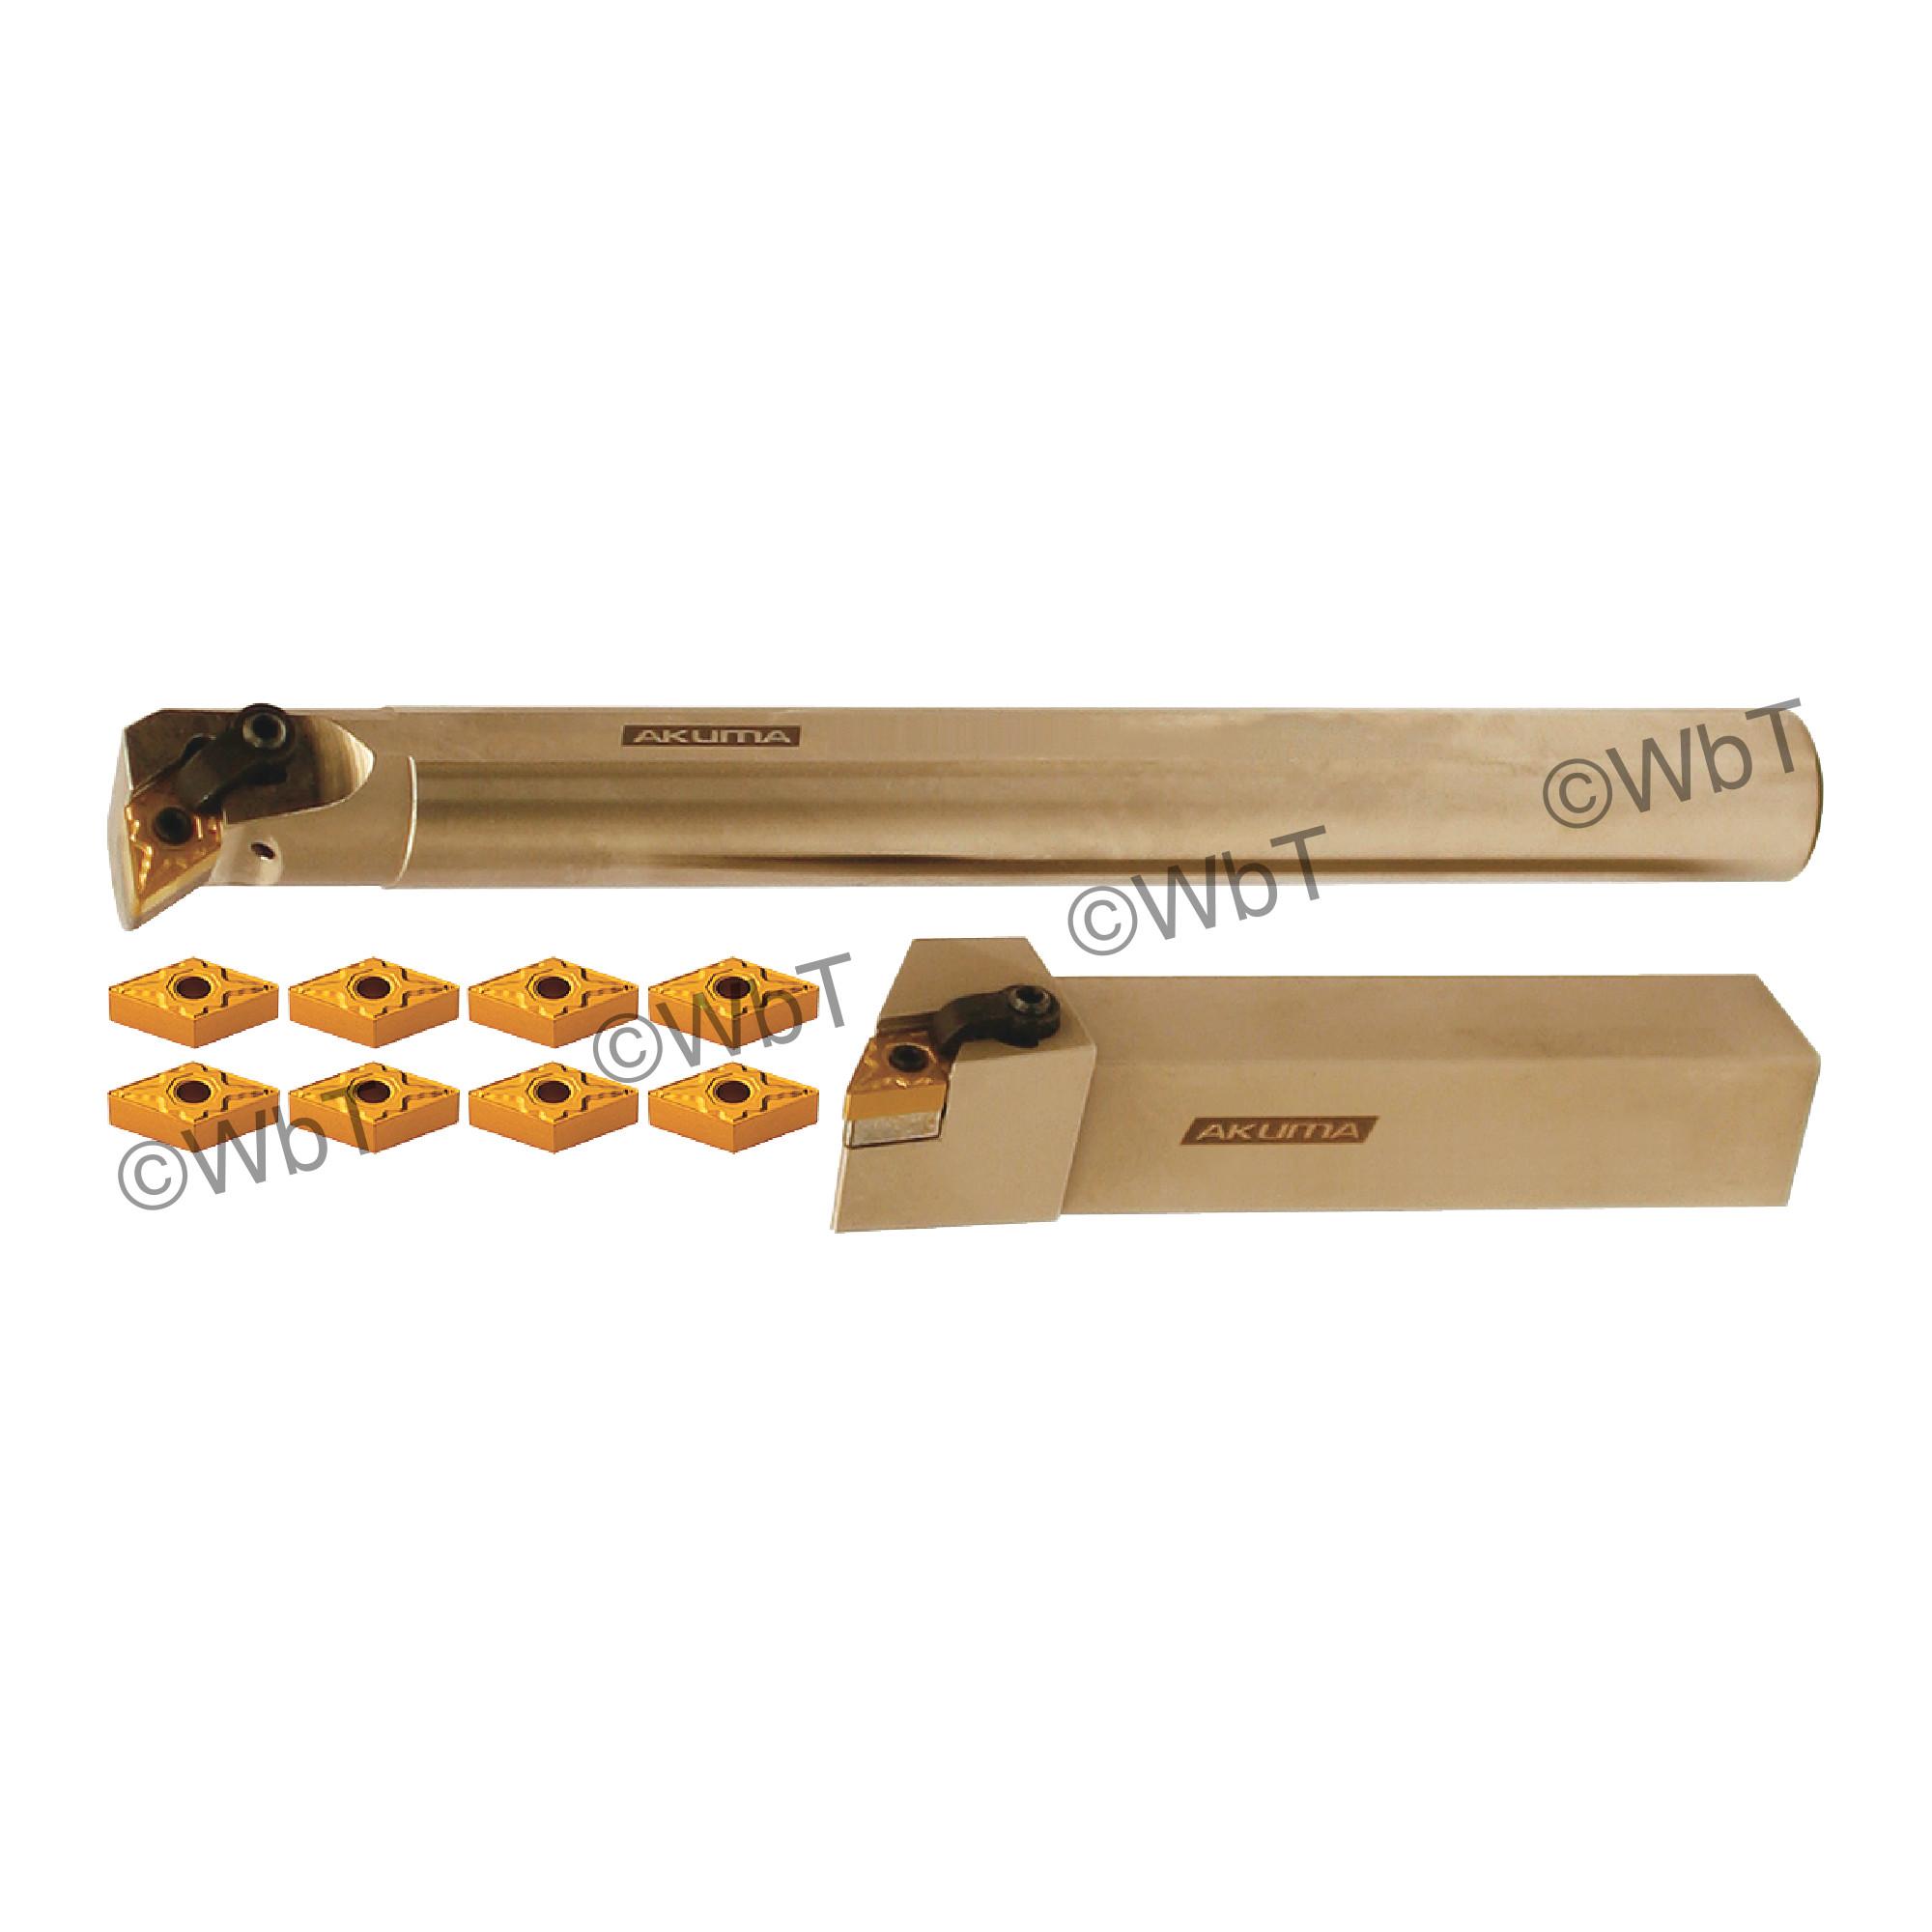 "AKUMA - 1.000"" DNMG43_ Turning & Boring Bar Set / Includes: (1) MDJNR16-4D (1.0"" Tool Holder), (1) A16S-MDUNR-4 (1.0""&os"